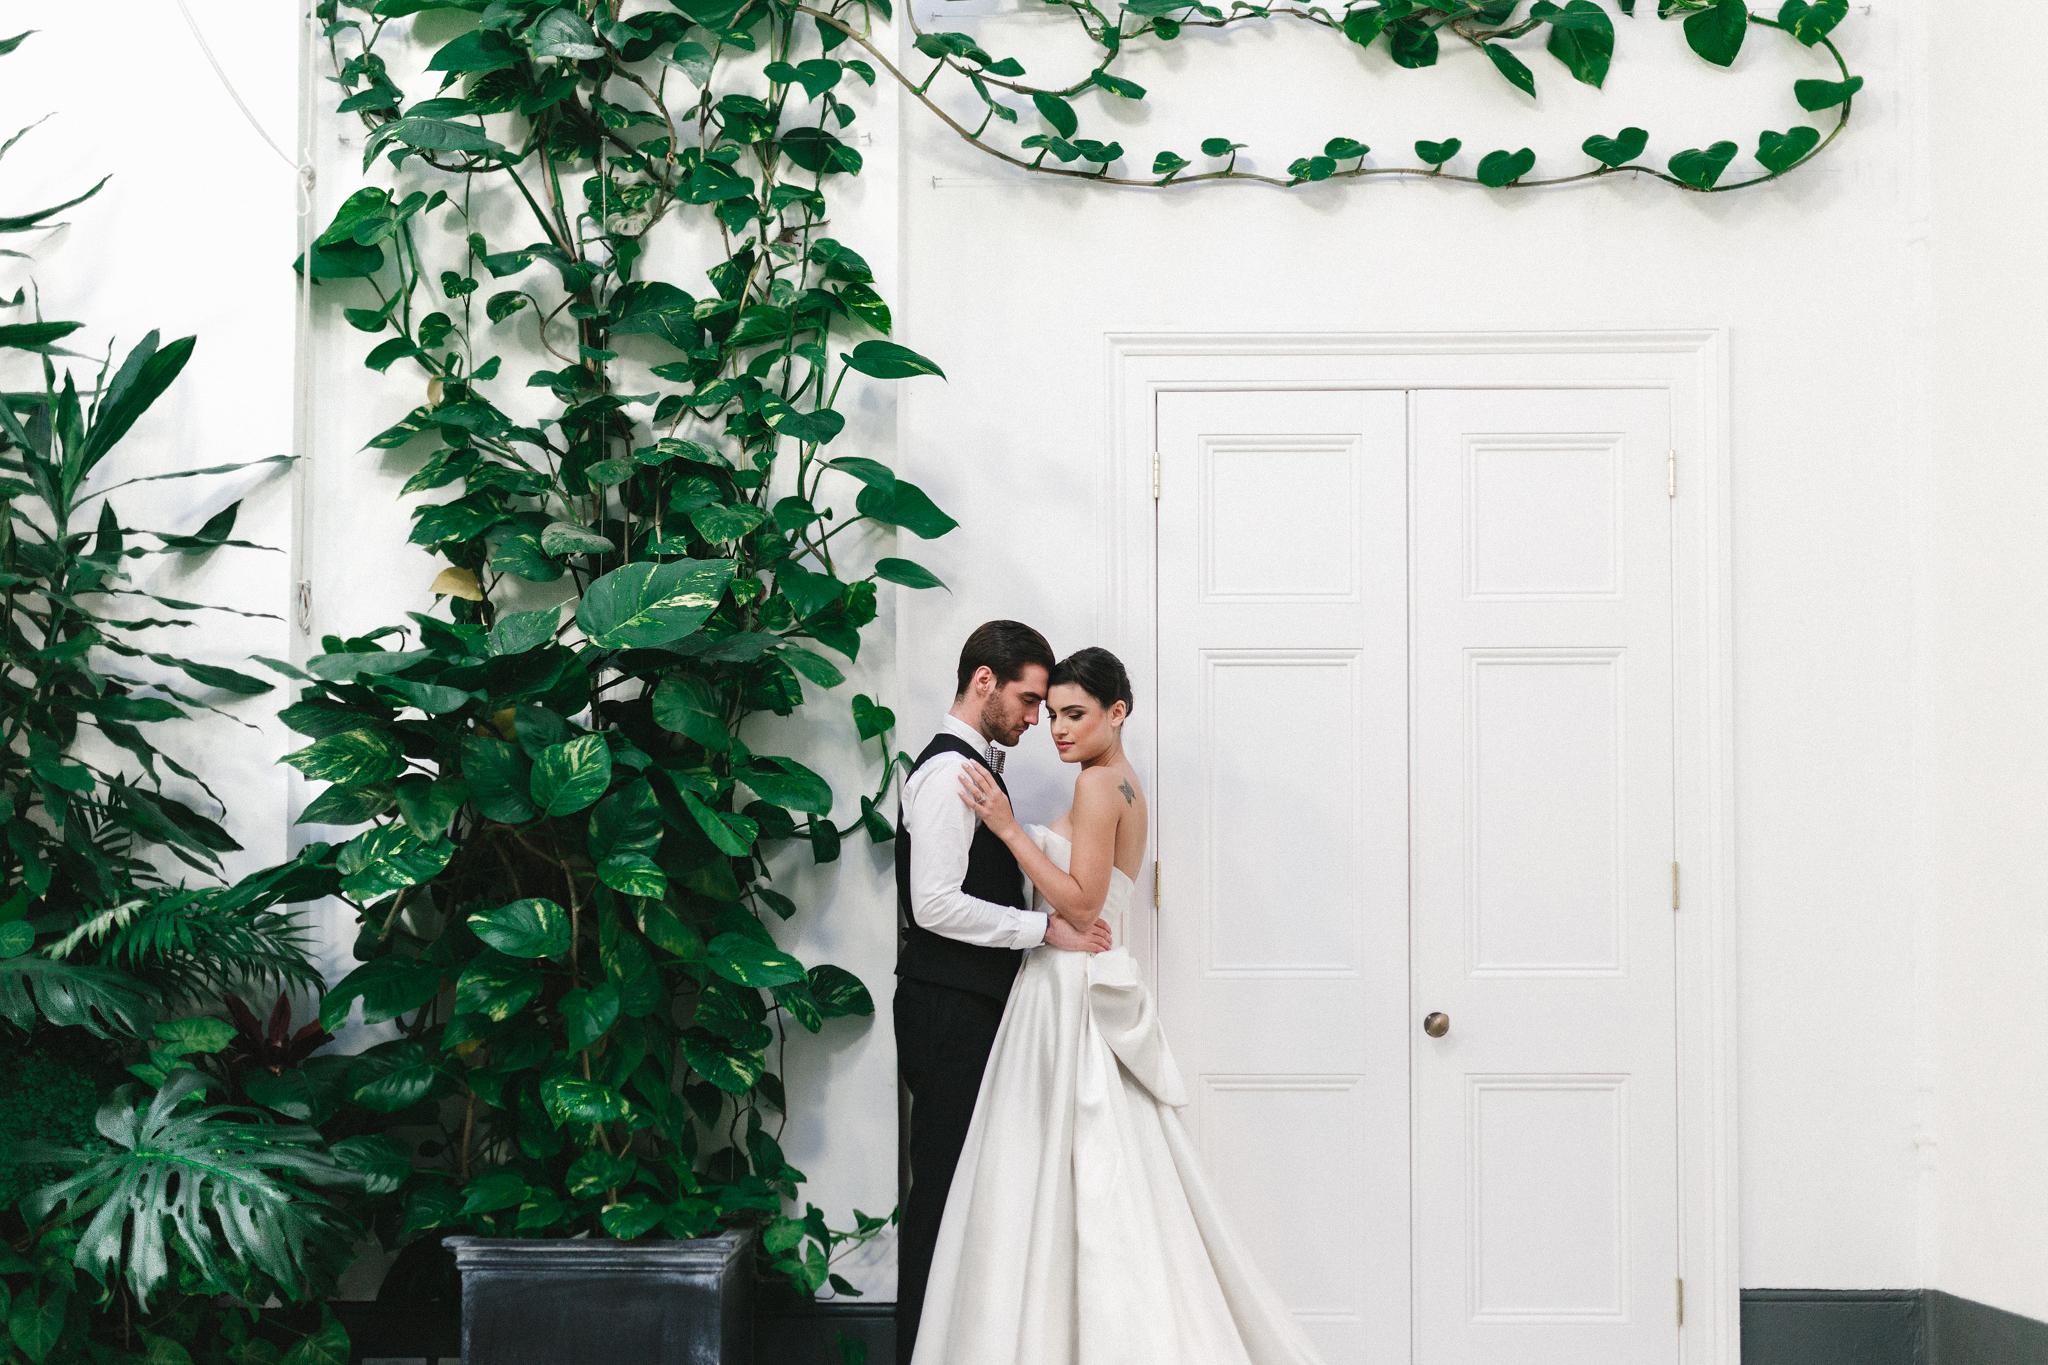 york house tickenham wedding decorations and dinner table glass room checkered floor wedding